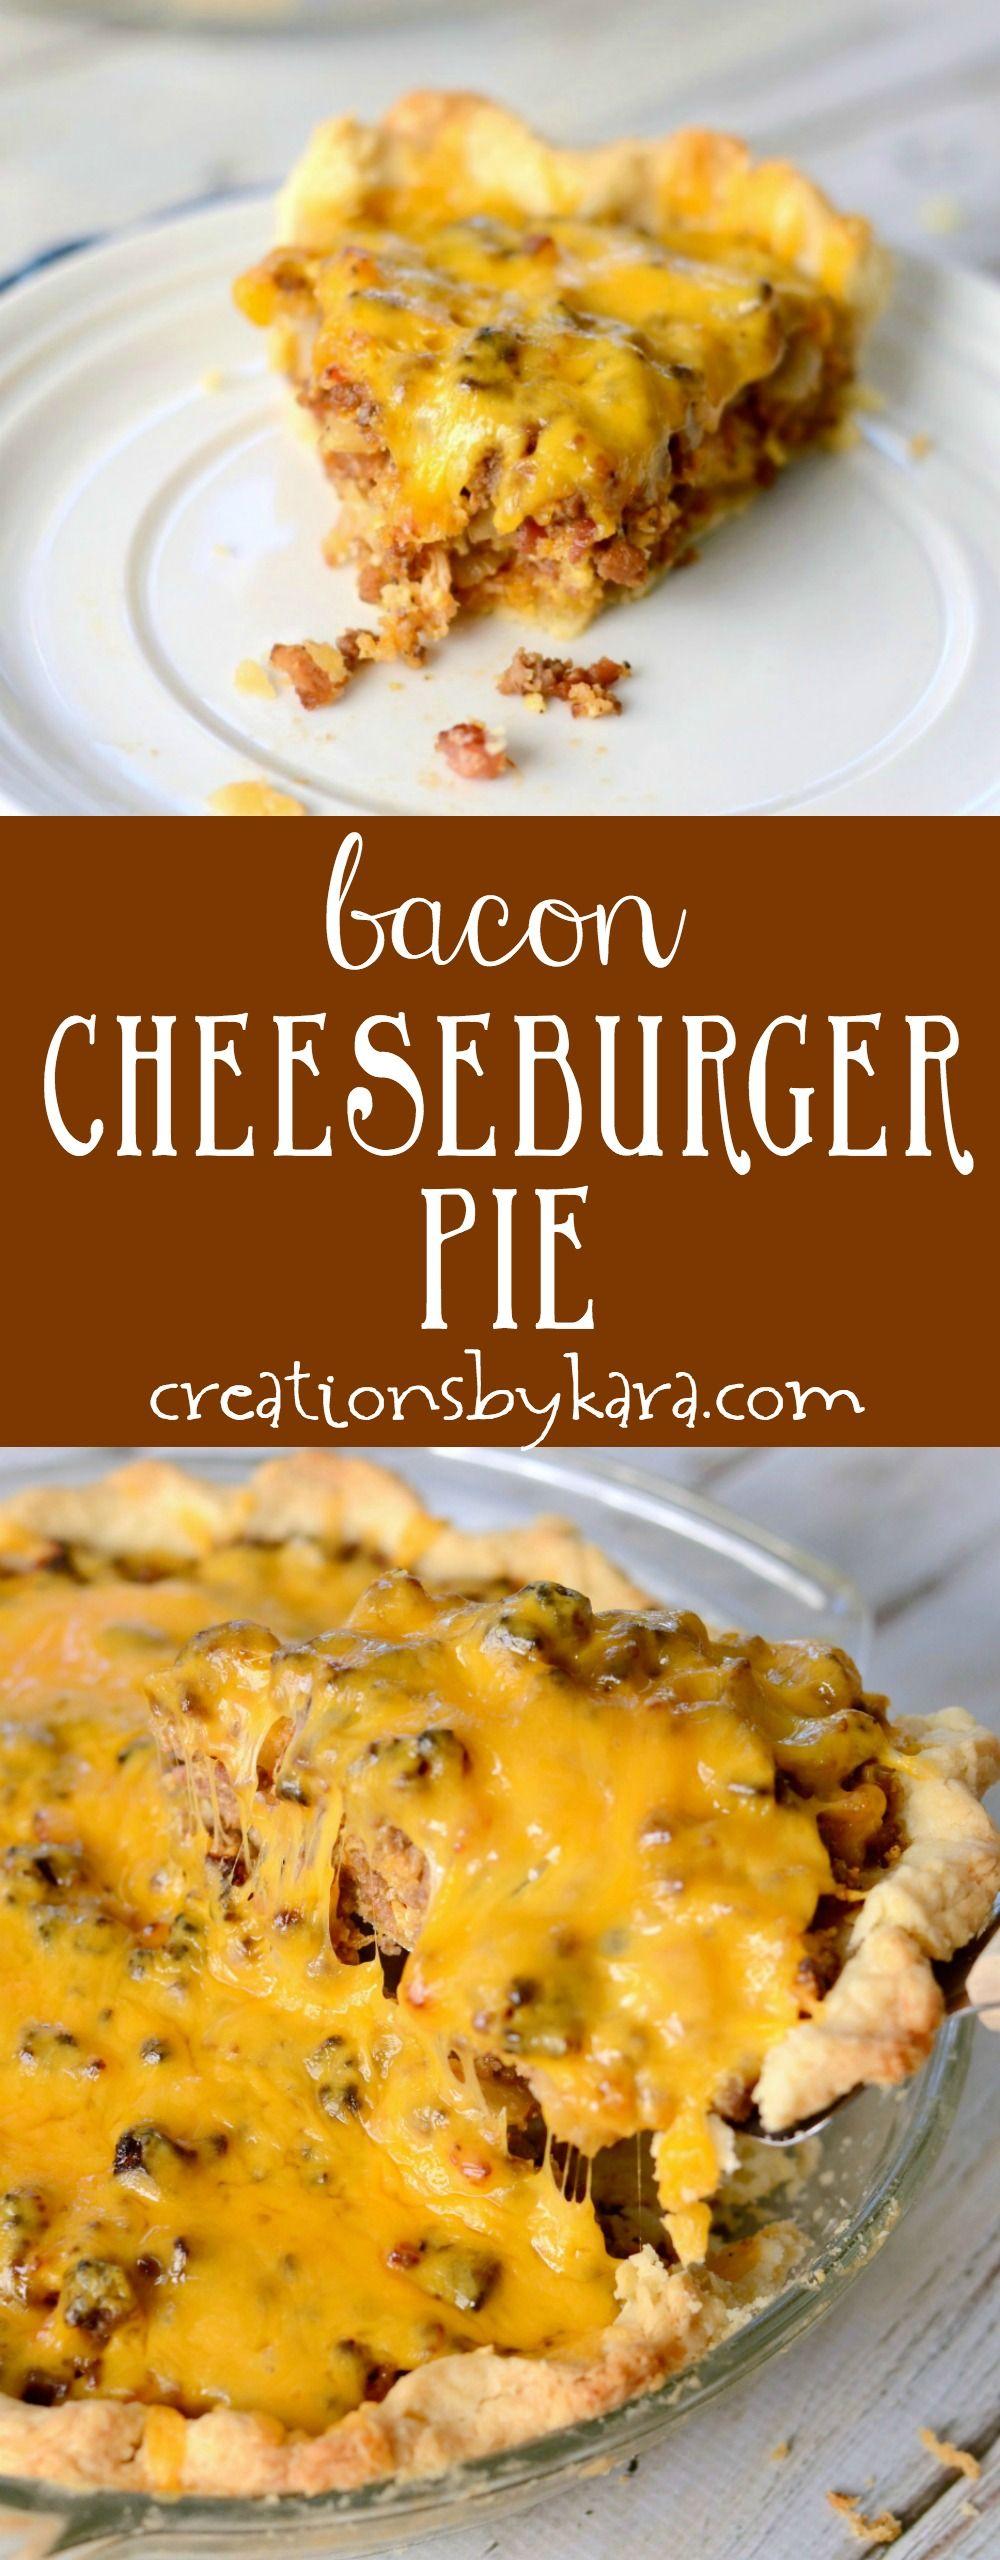 Bacon Cheeseburger Pie Recipe - Creations by Kara